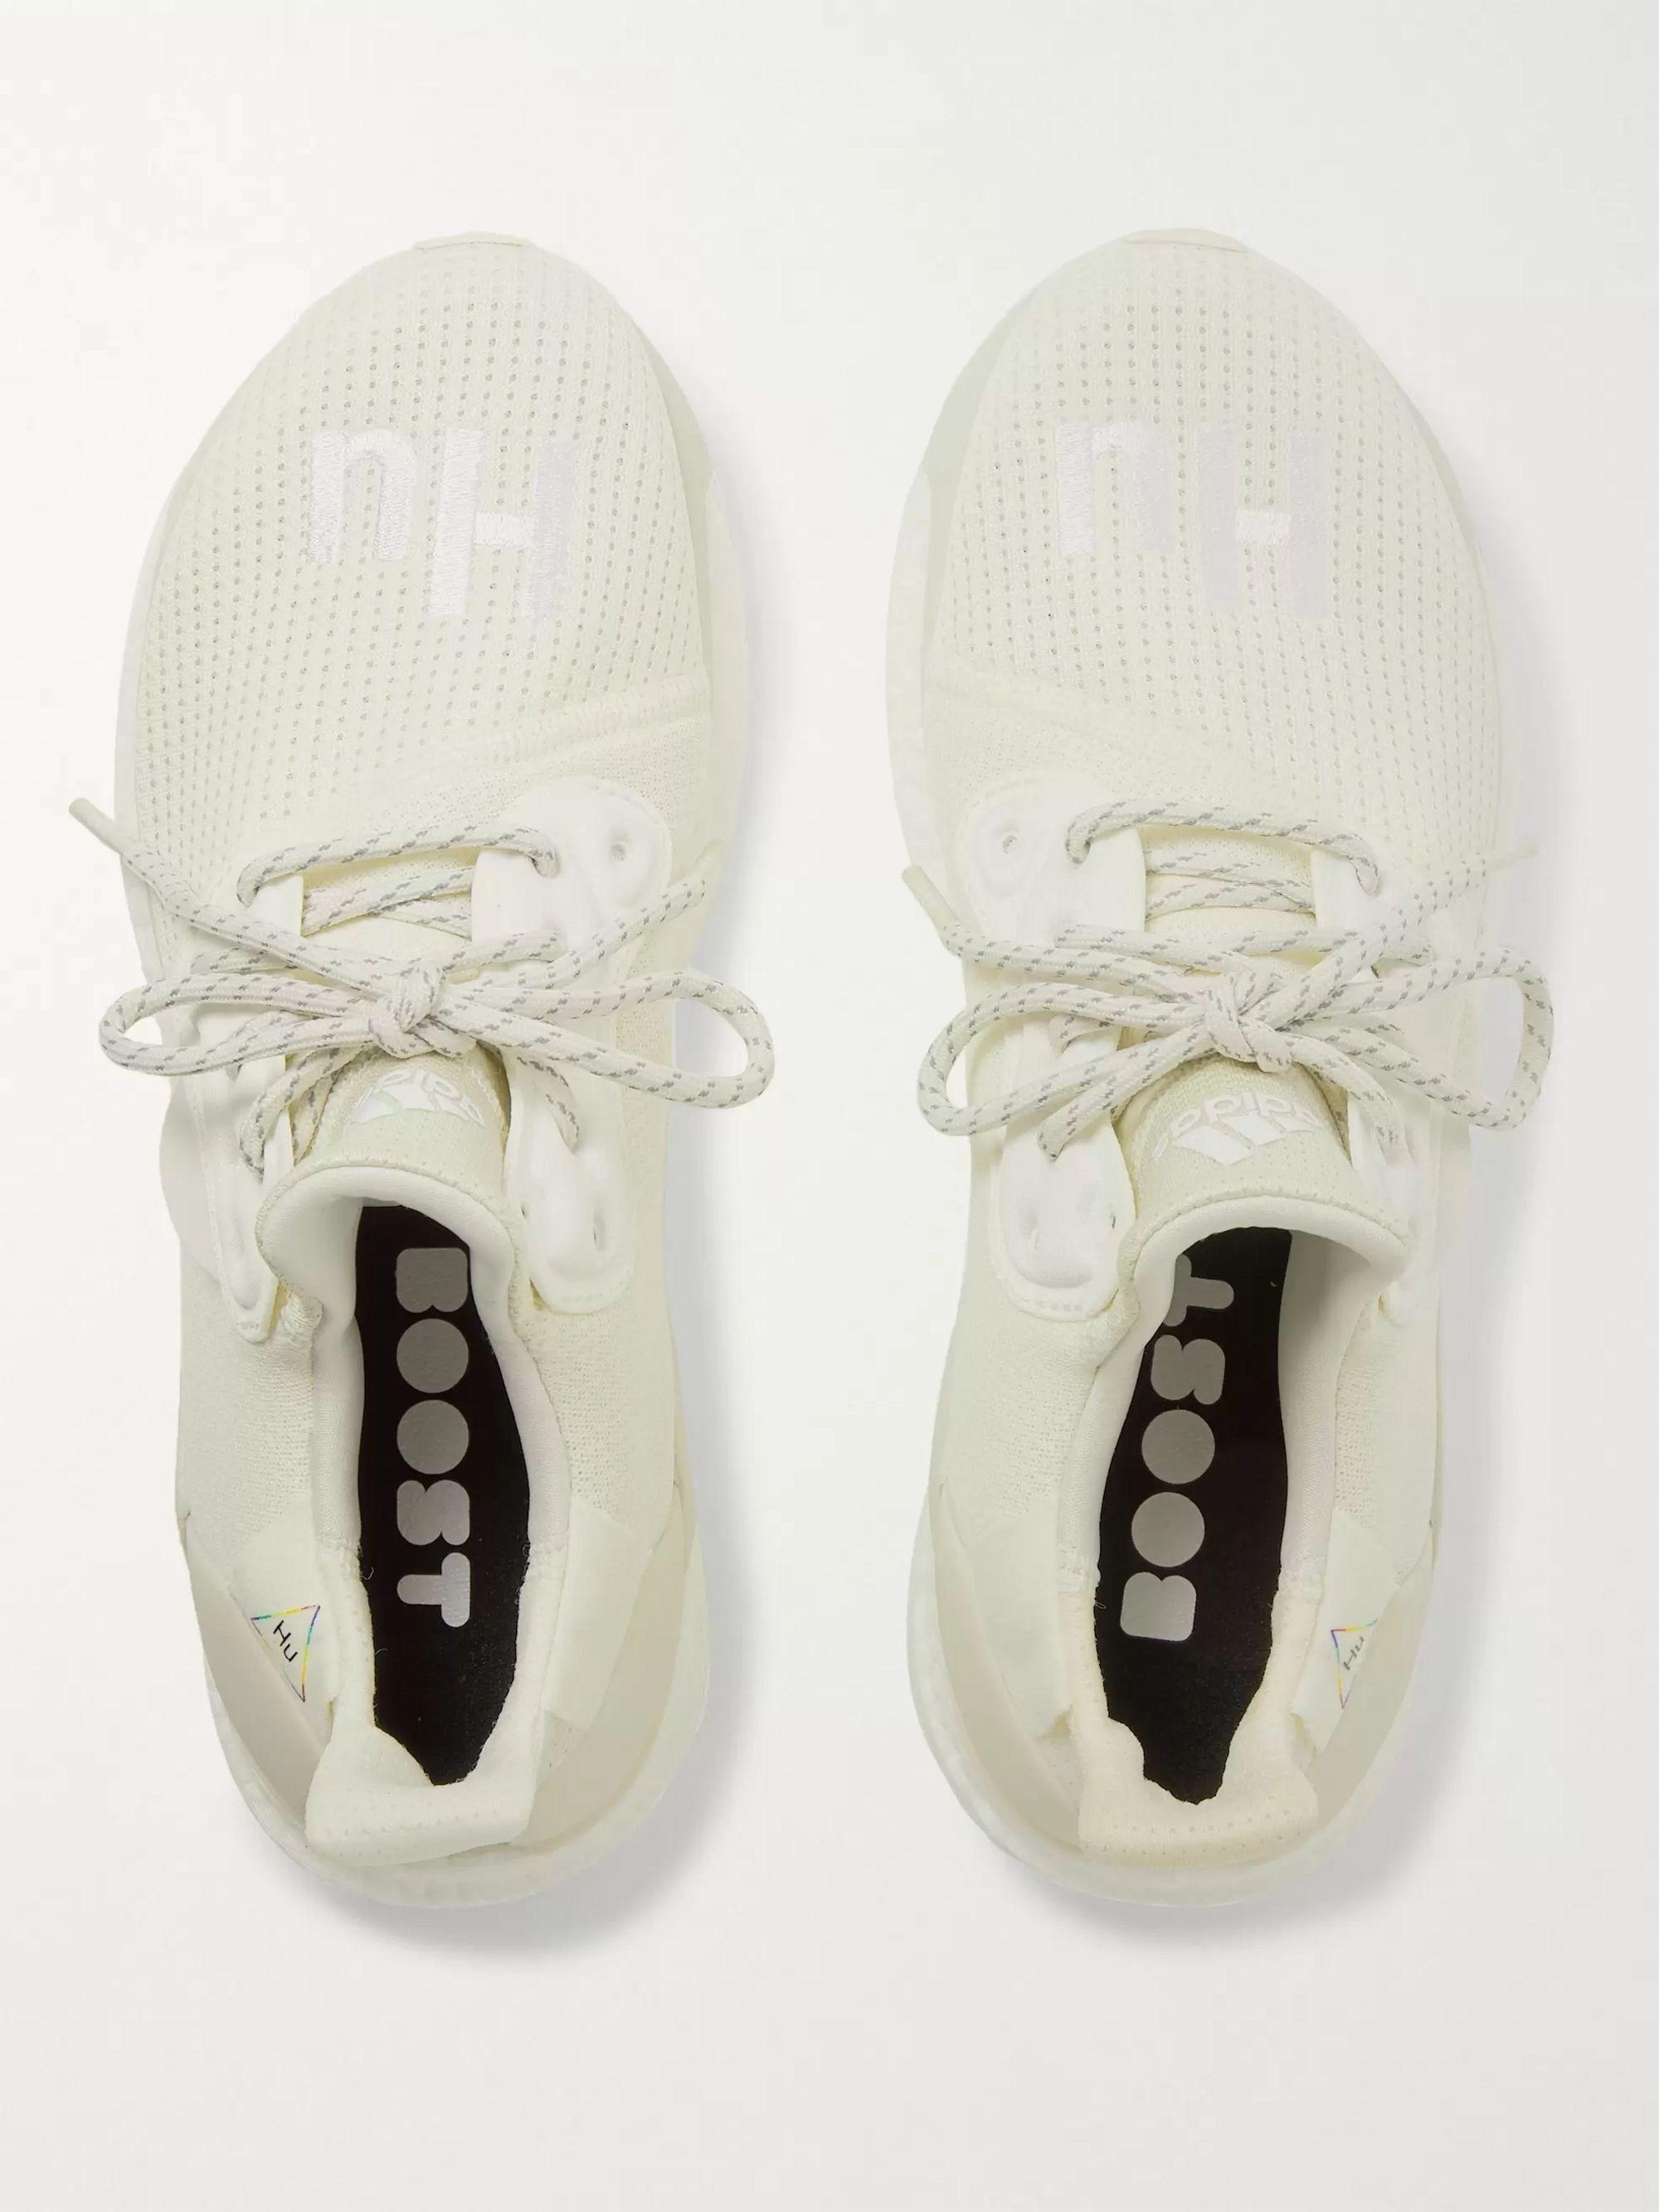 Pharrell's adidas Tennis Hu V2 Appears In More Monochromatic